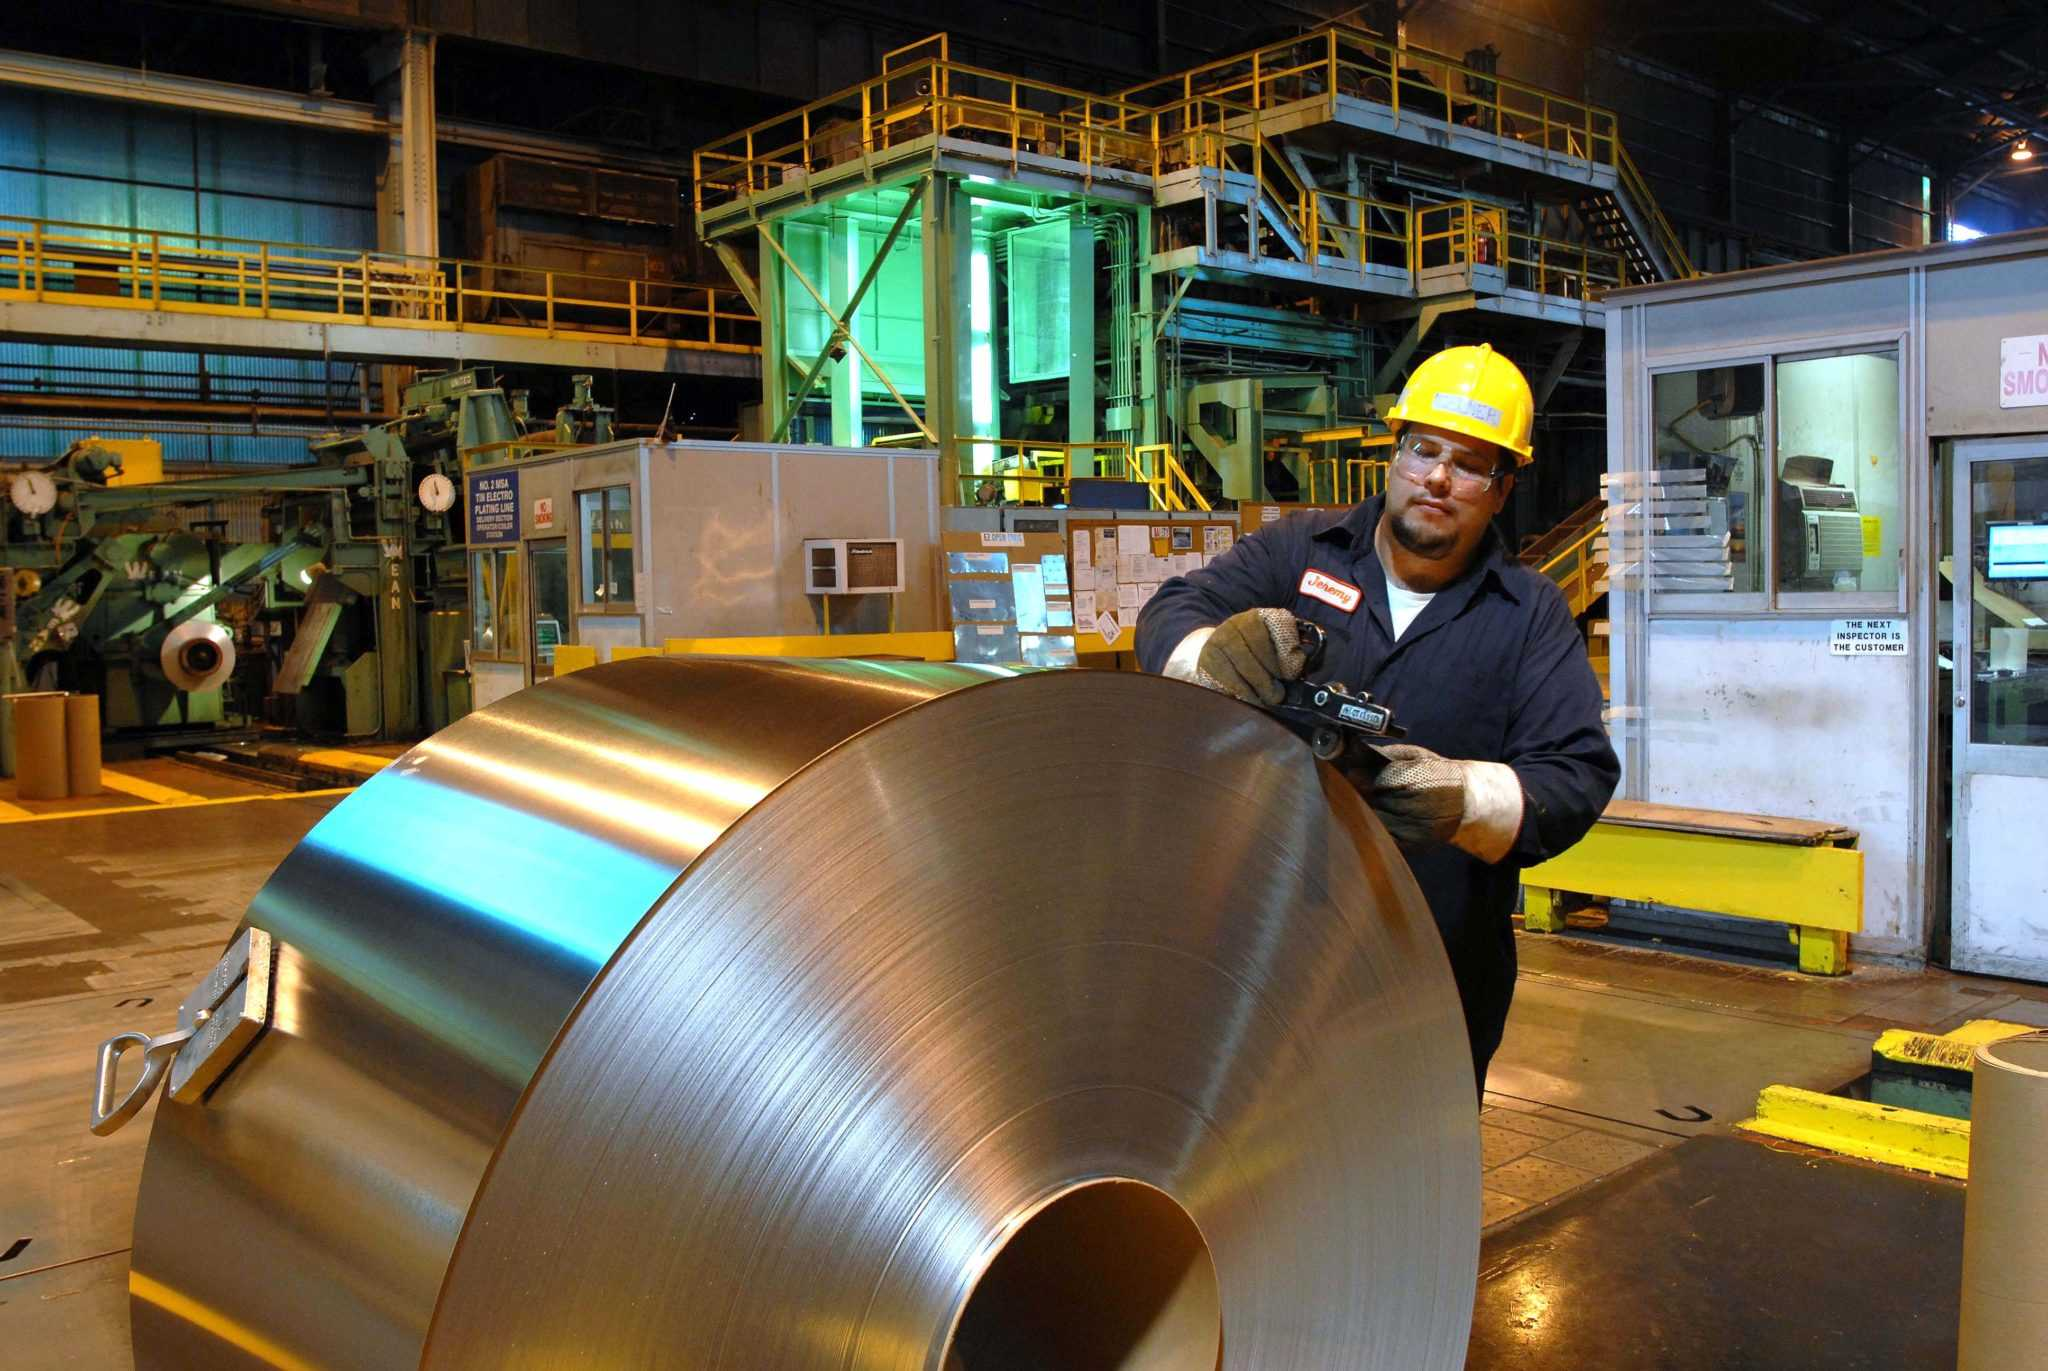 производство луженой стали